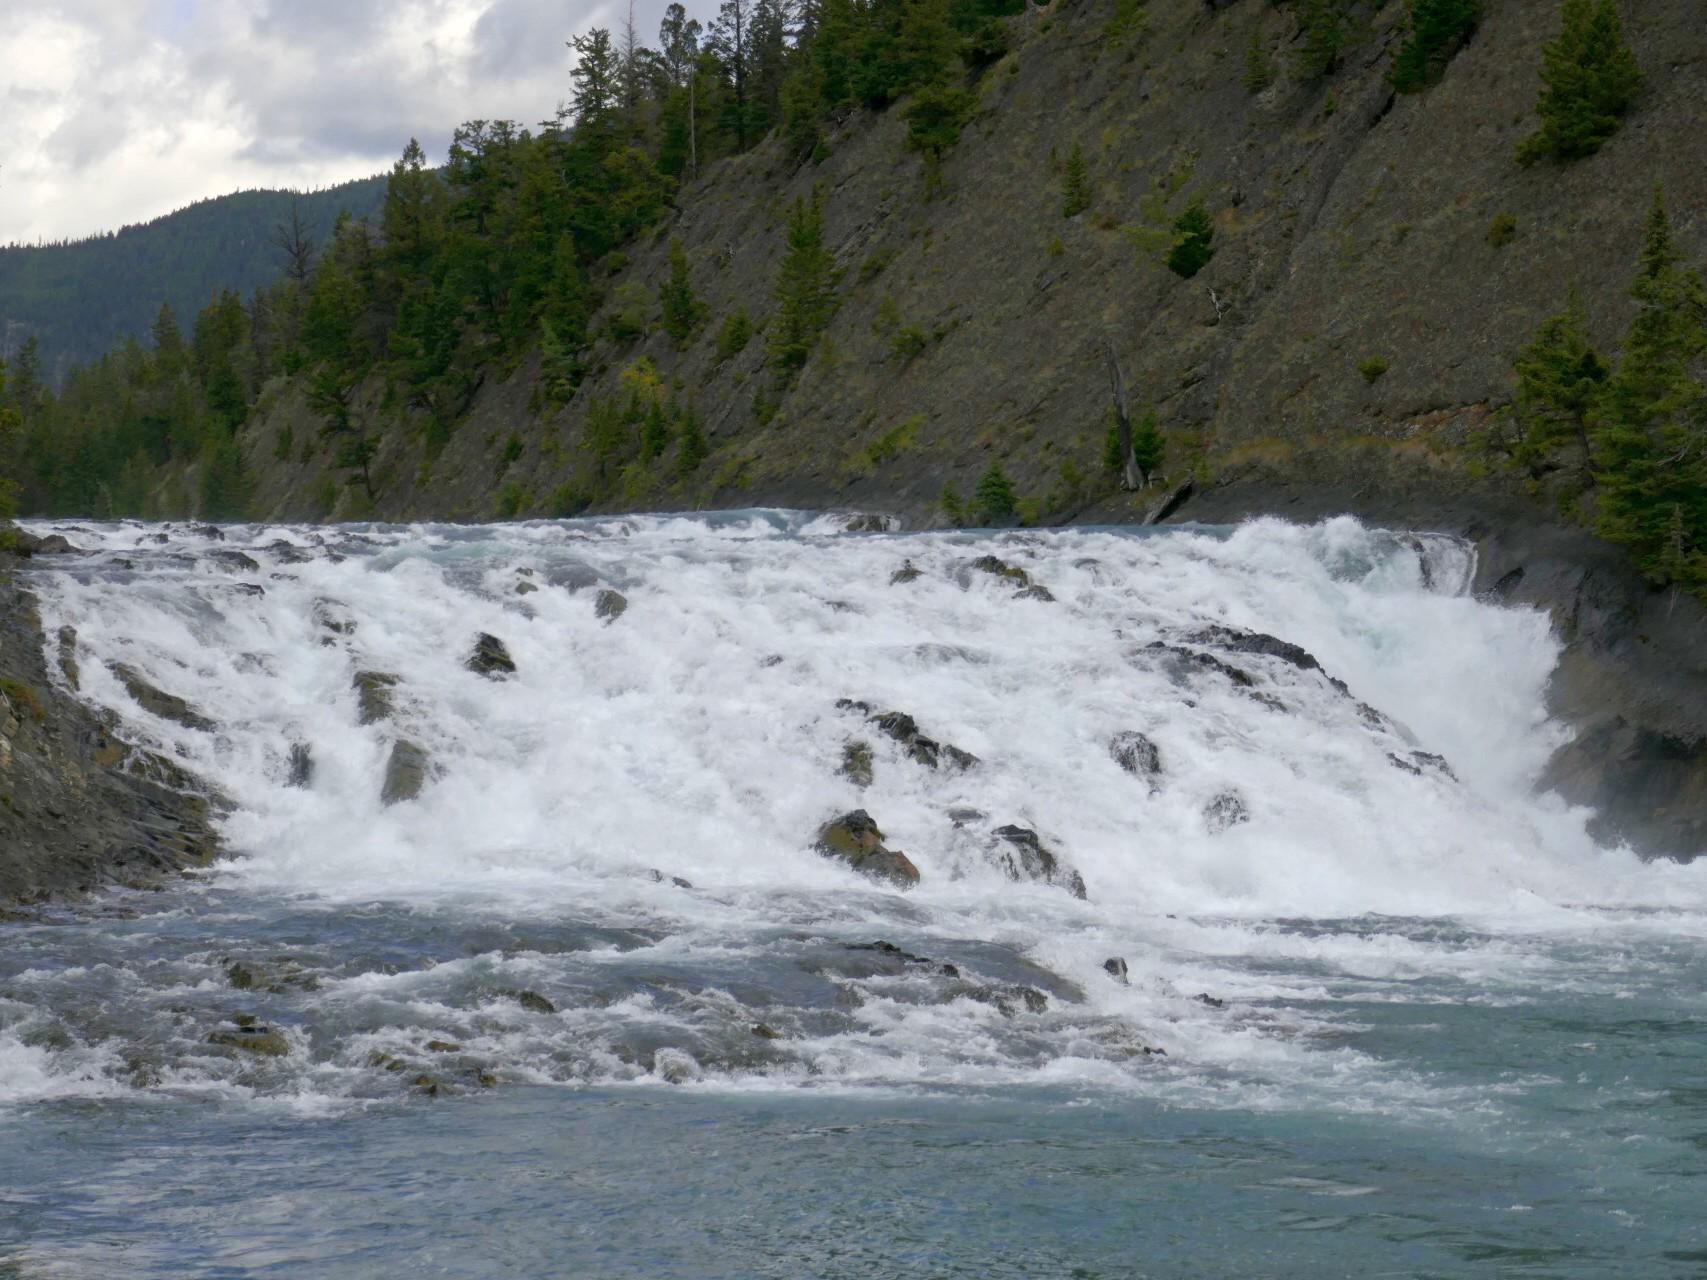 BANFF-Chutes rivières Bow